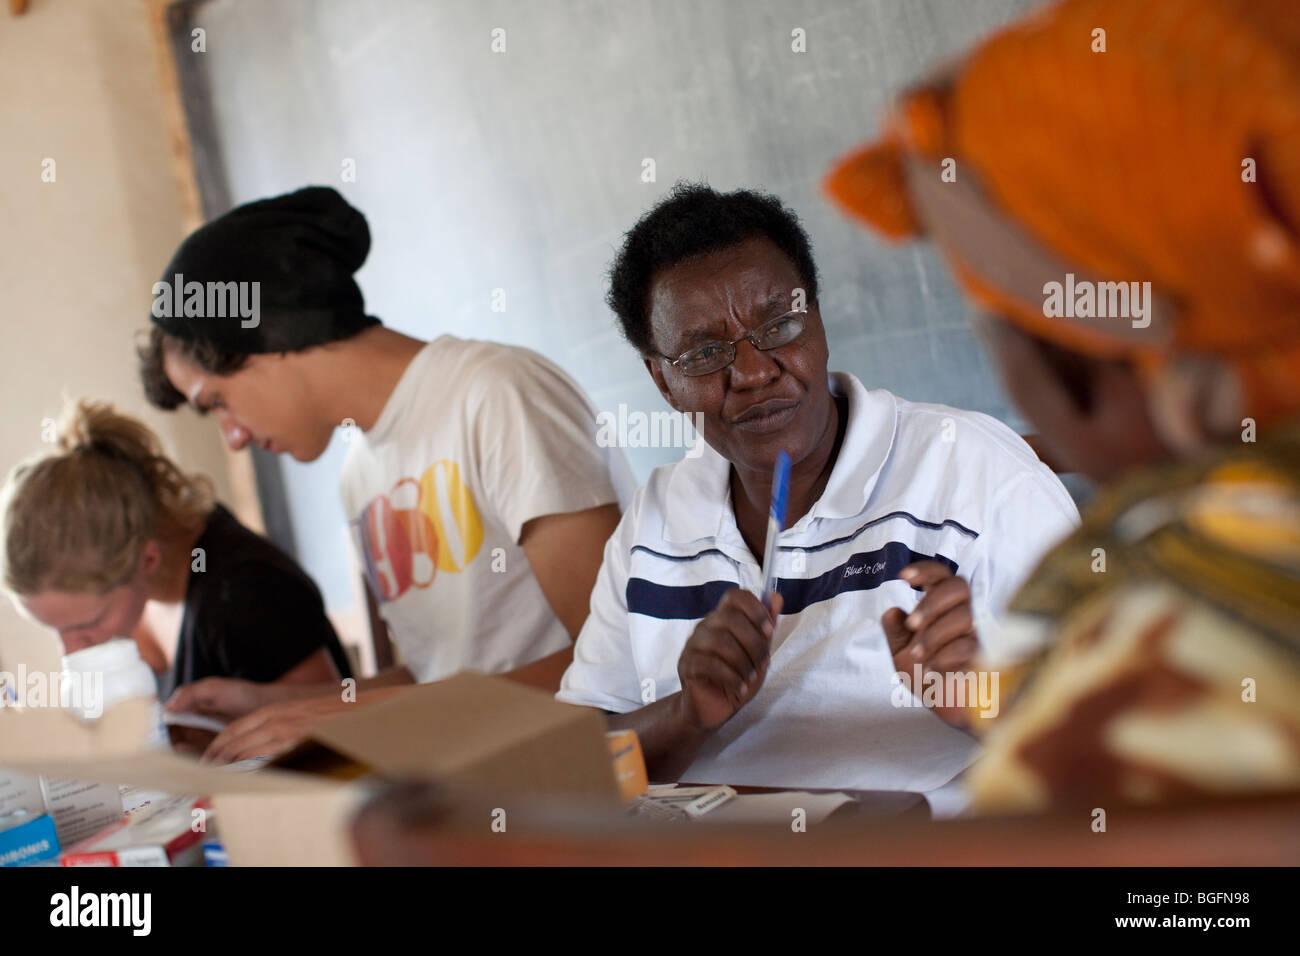 A nurse consults with a patient at a medical dispensary in Tanzania: Manyara Region, Simanjiro District, Kilombero Stock Photo